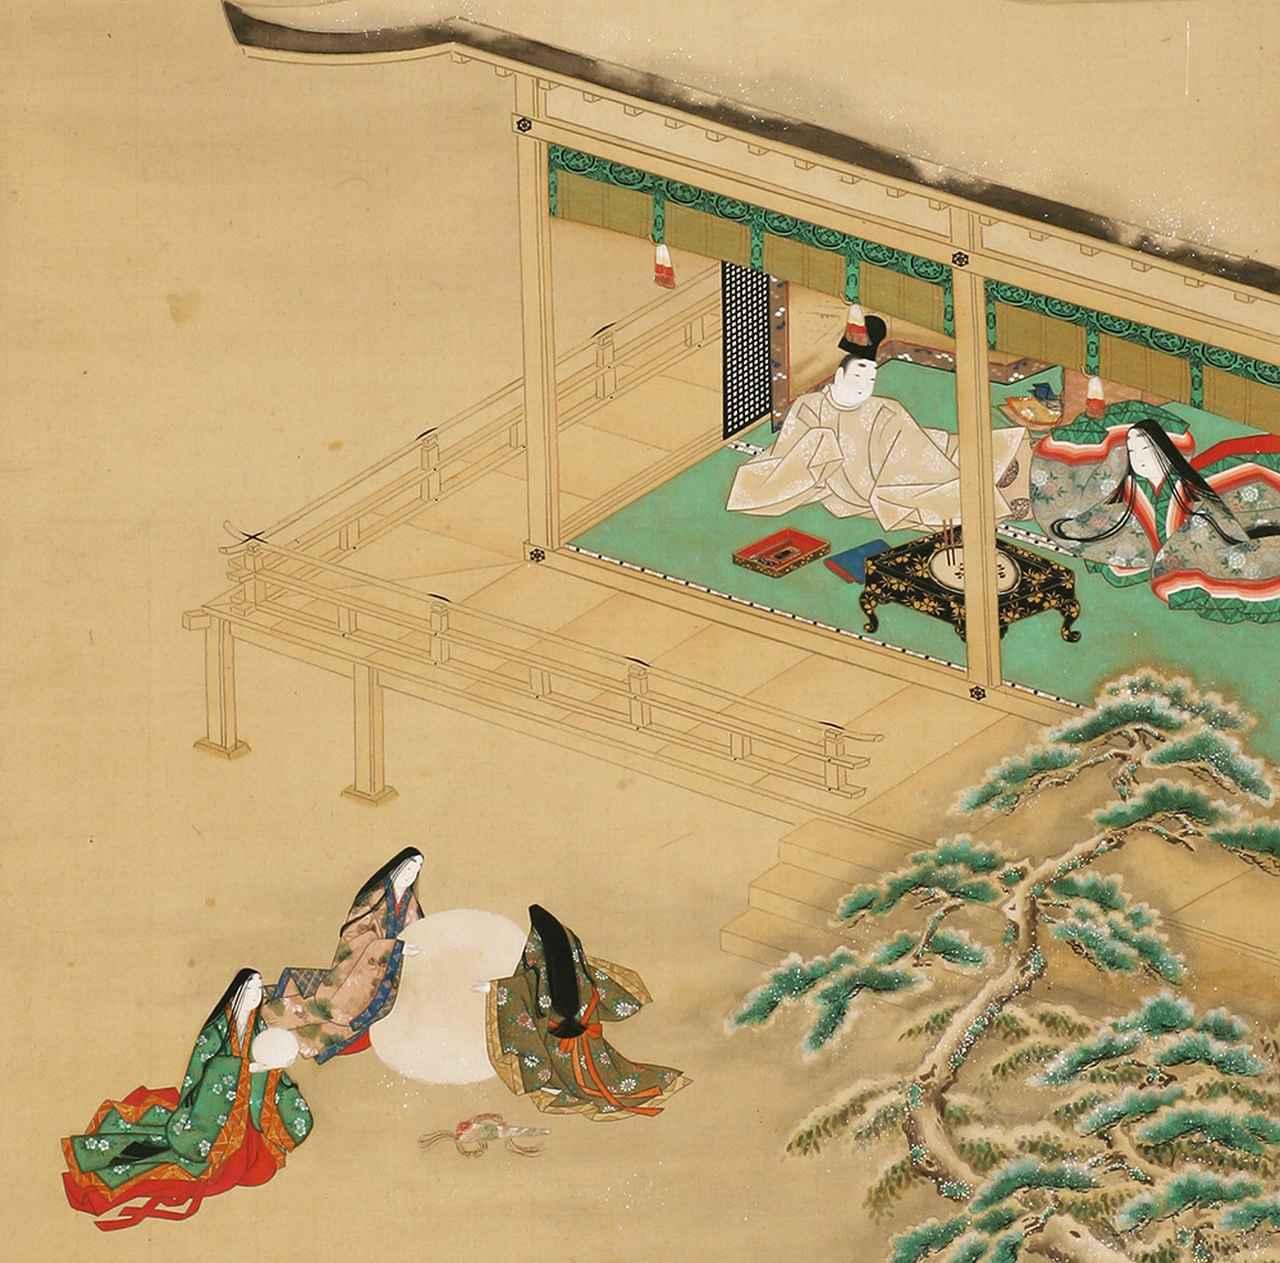 Images : 『はじめての古美術鑑賞ー絵画のテーマ』|根津美術館